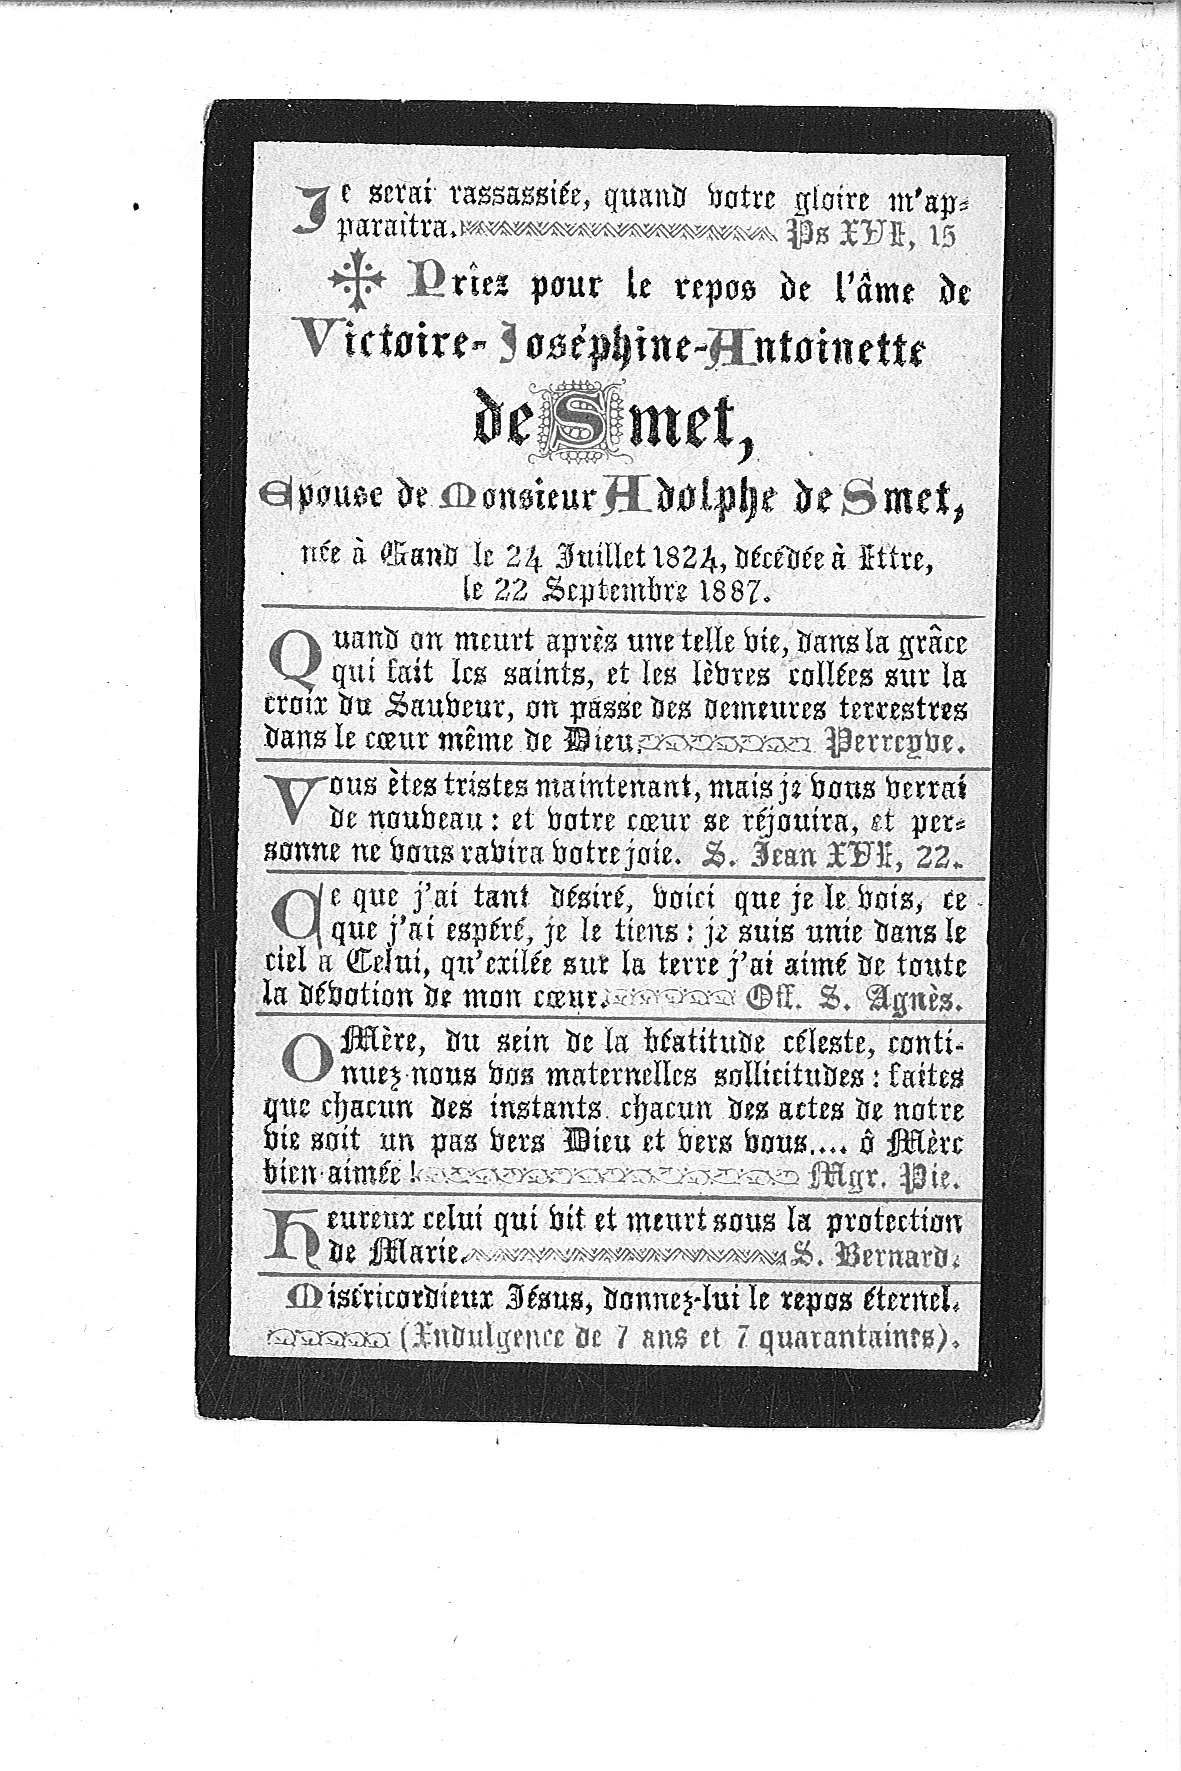 Victoire-Joséphine-Antoinette (1887) 20120424121349_00096.jpg